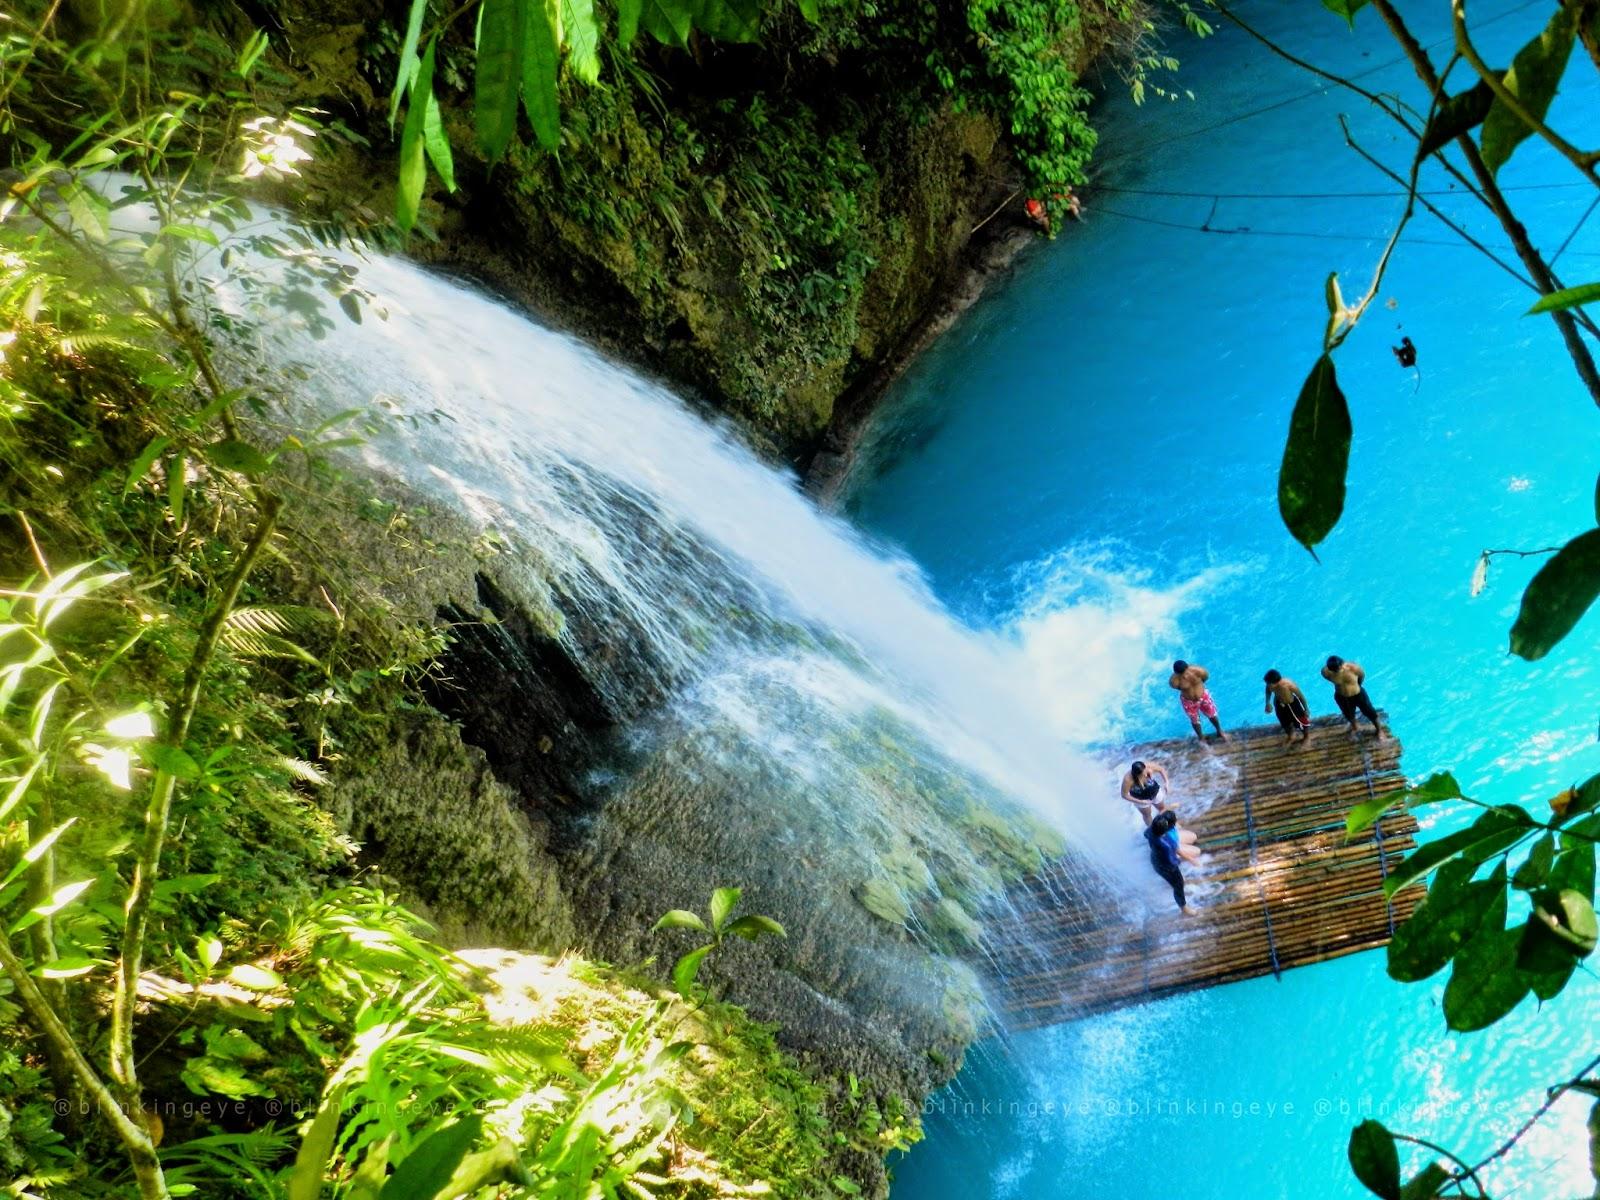 Kawasan Falls Matutinao Badian Cebu Blinkingeye Travels